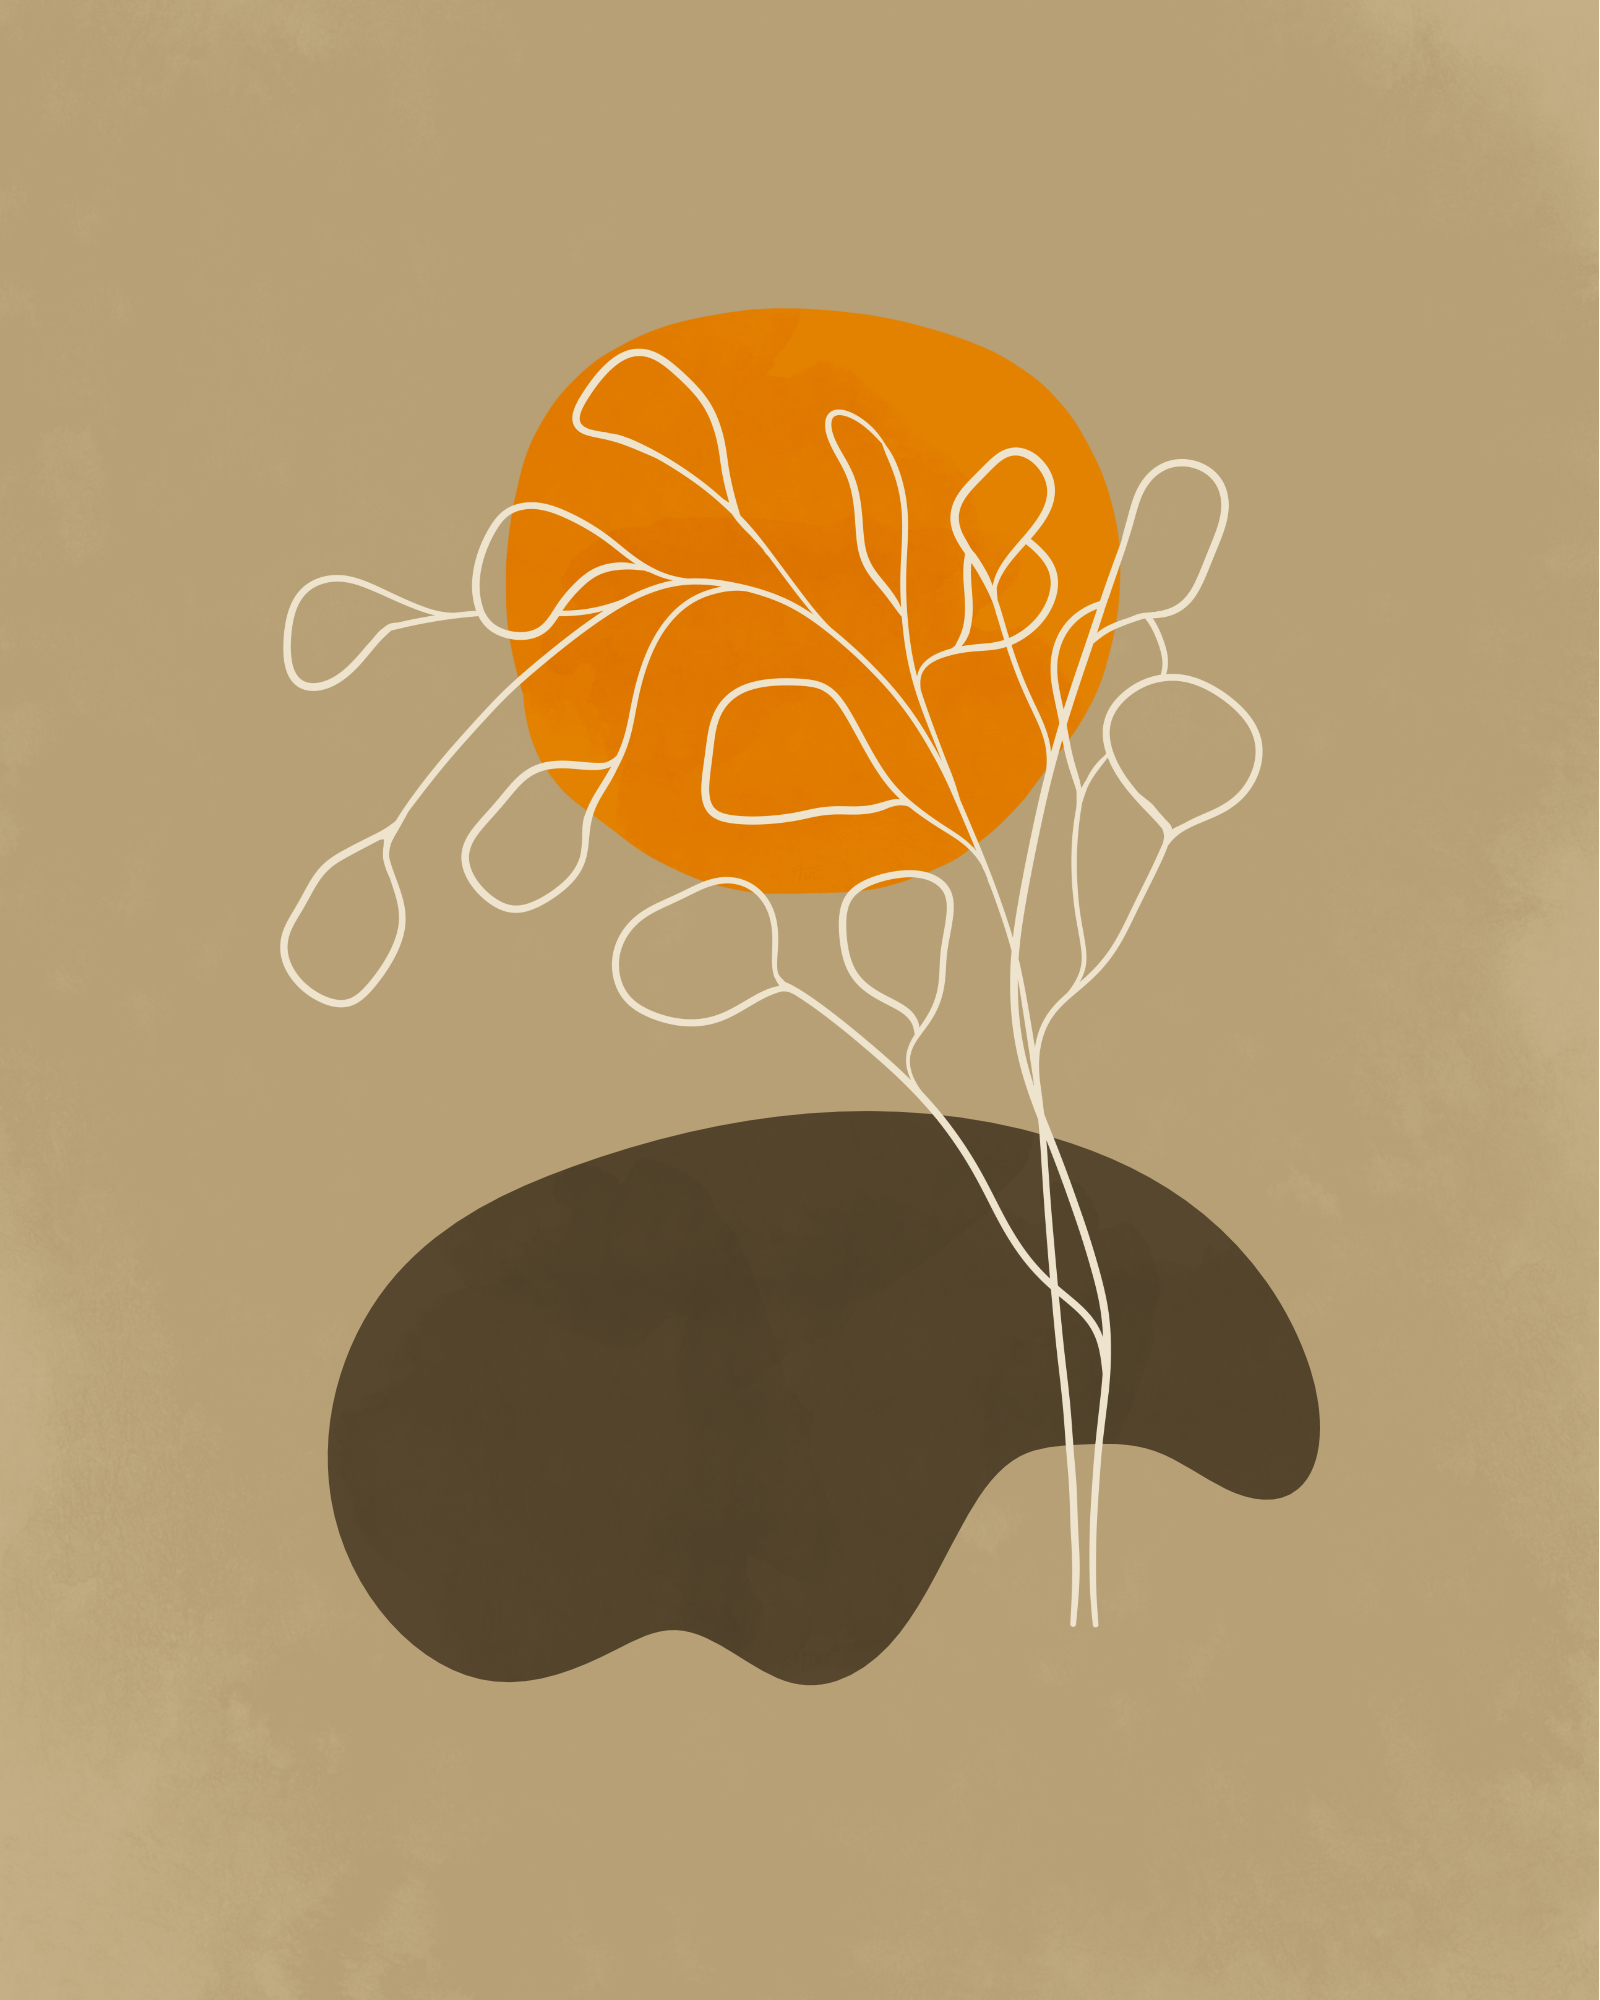 Minimalist landscape in light autumn colors with an orange sun 3